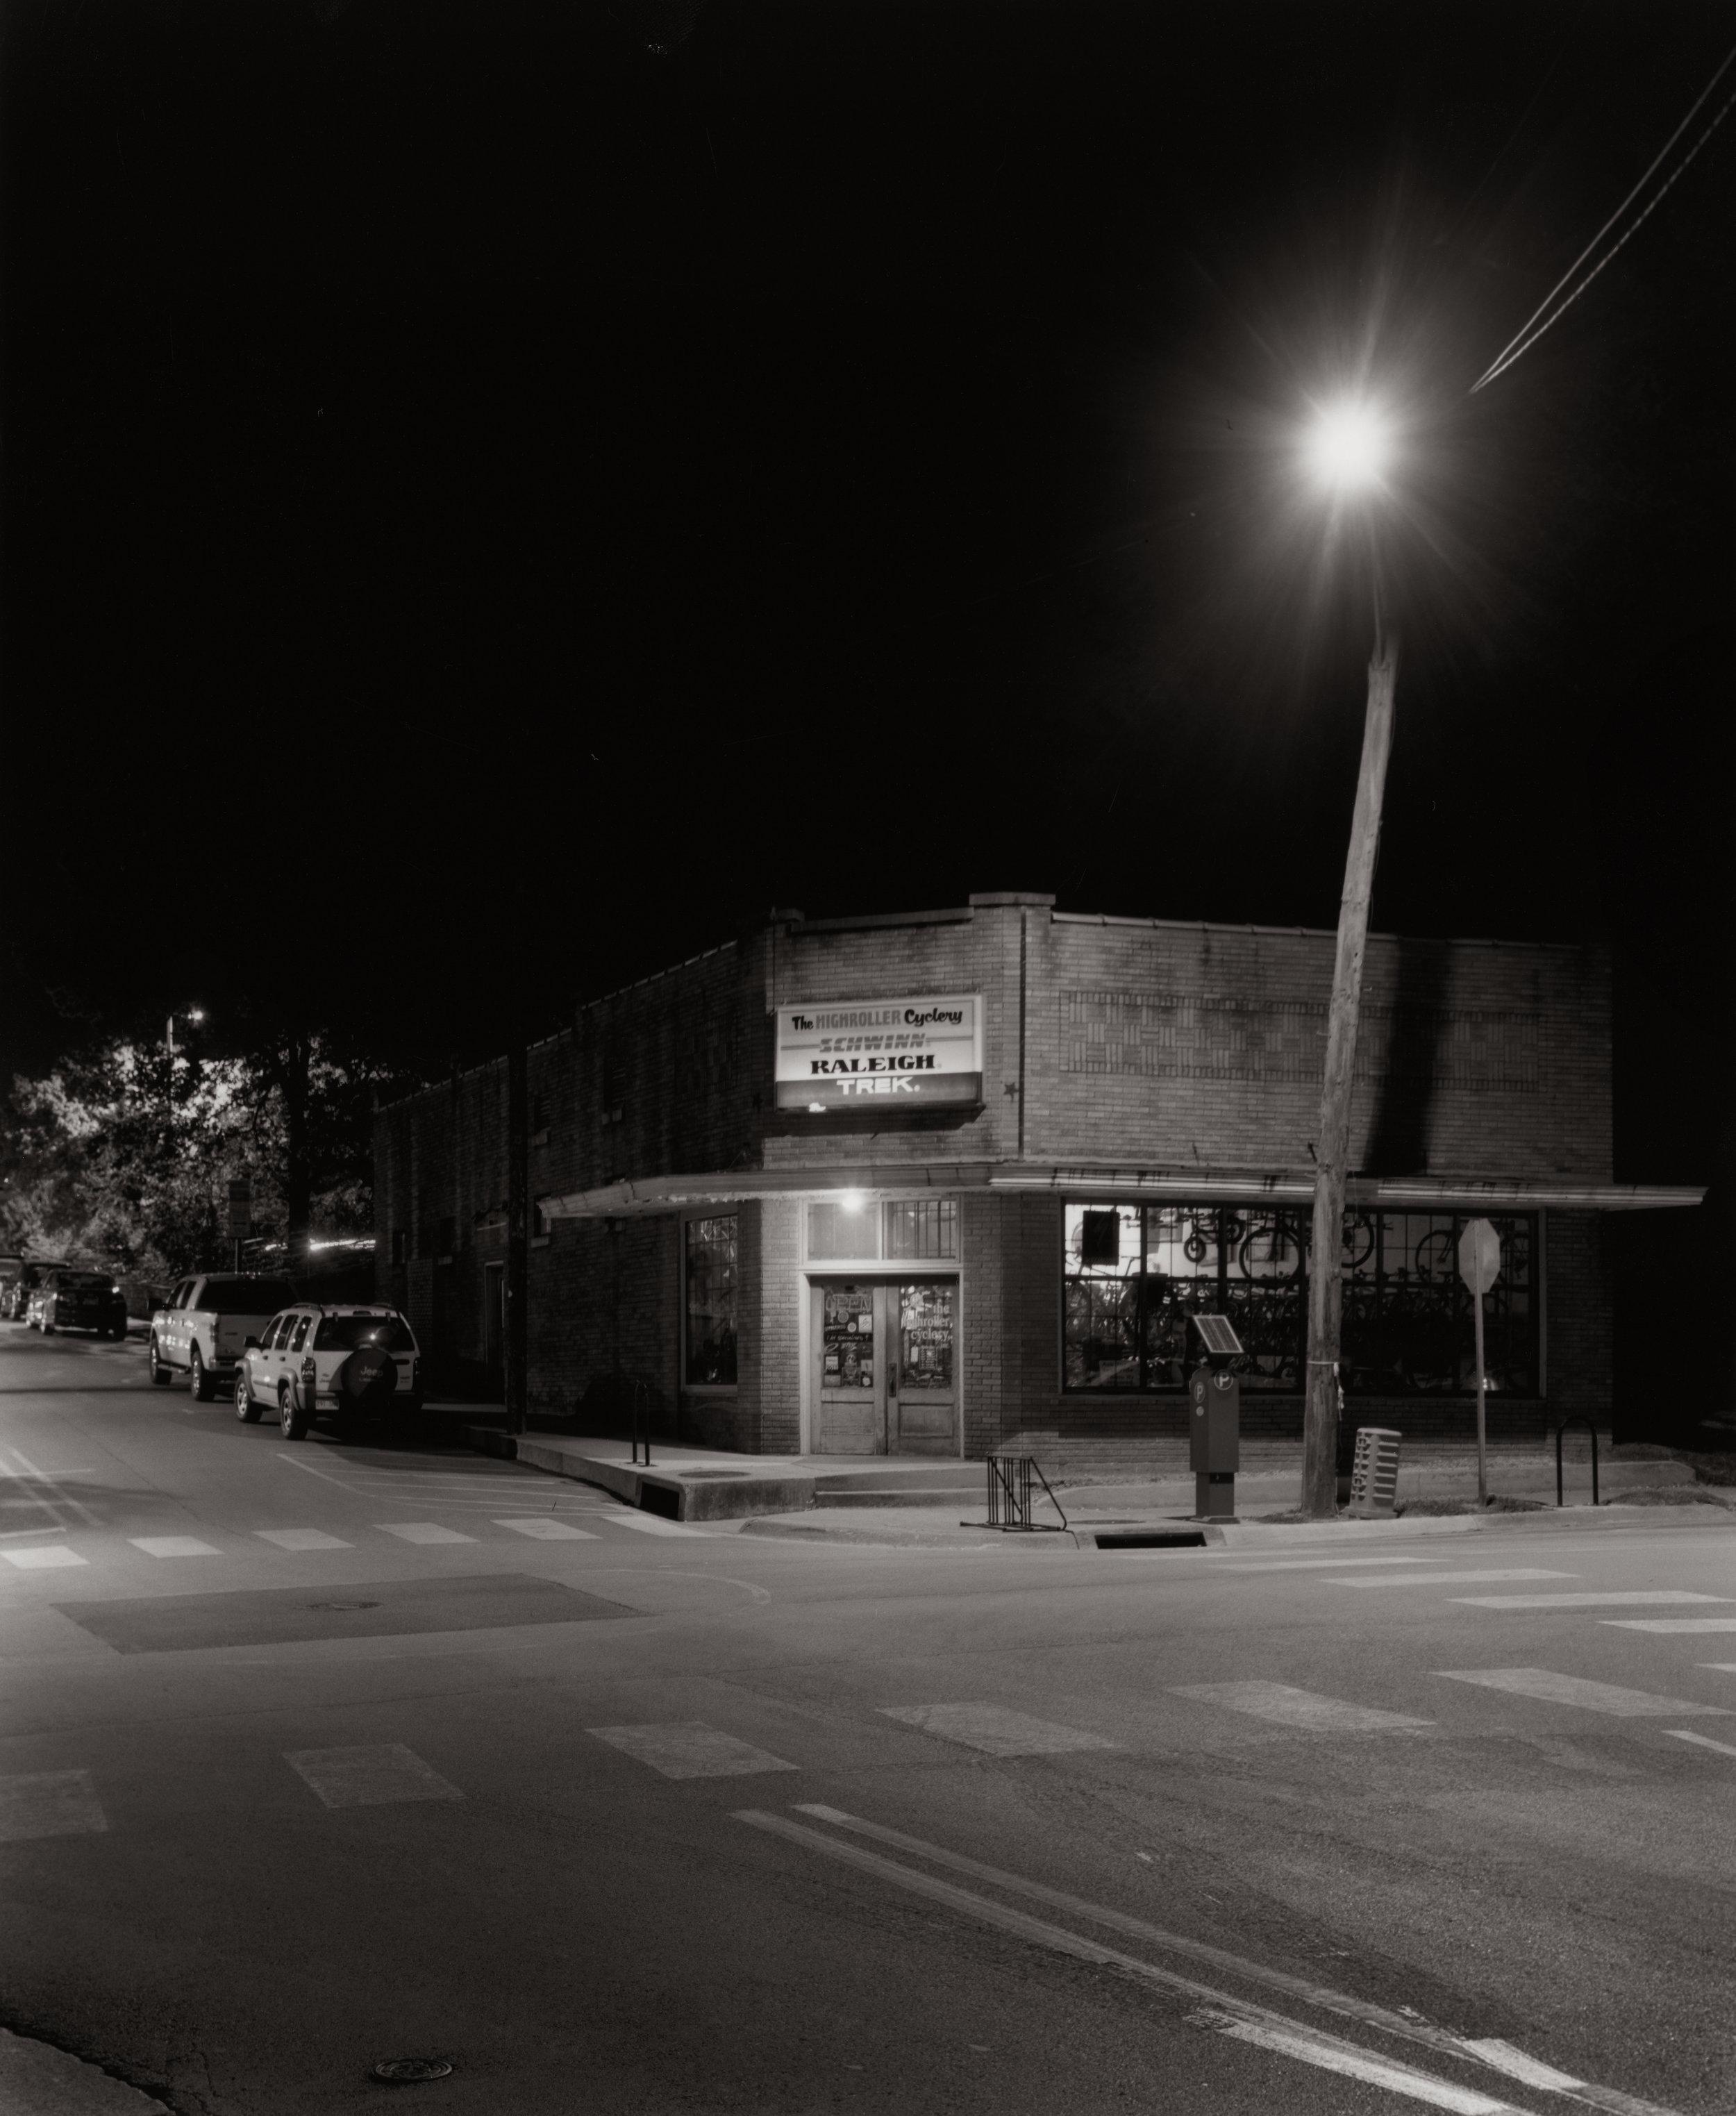 Spring Street, Fayetteville, 2017